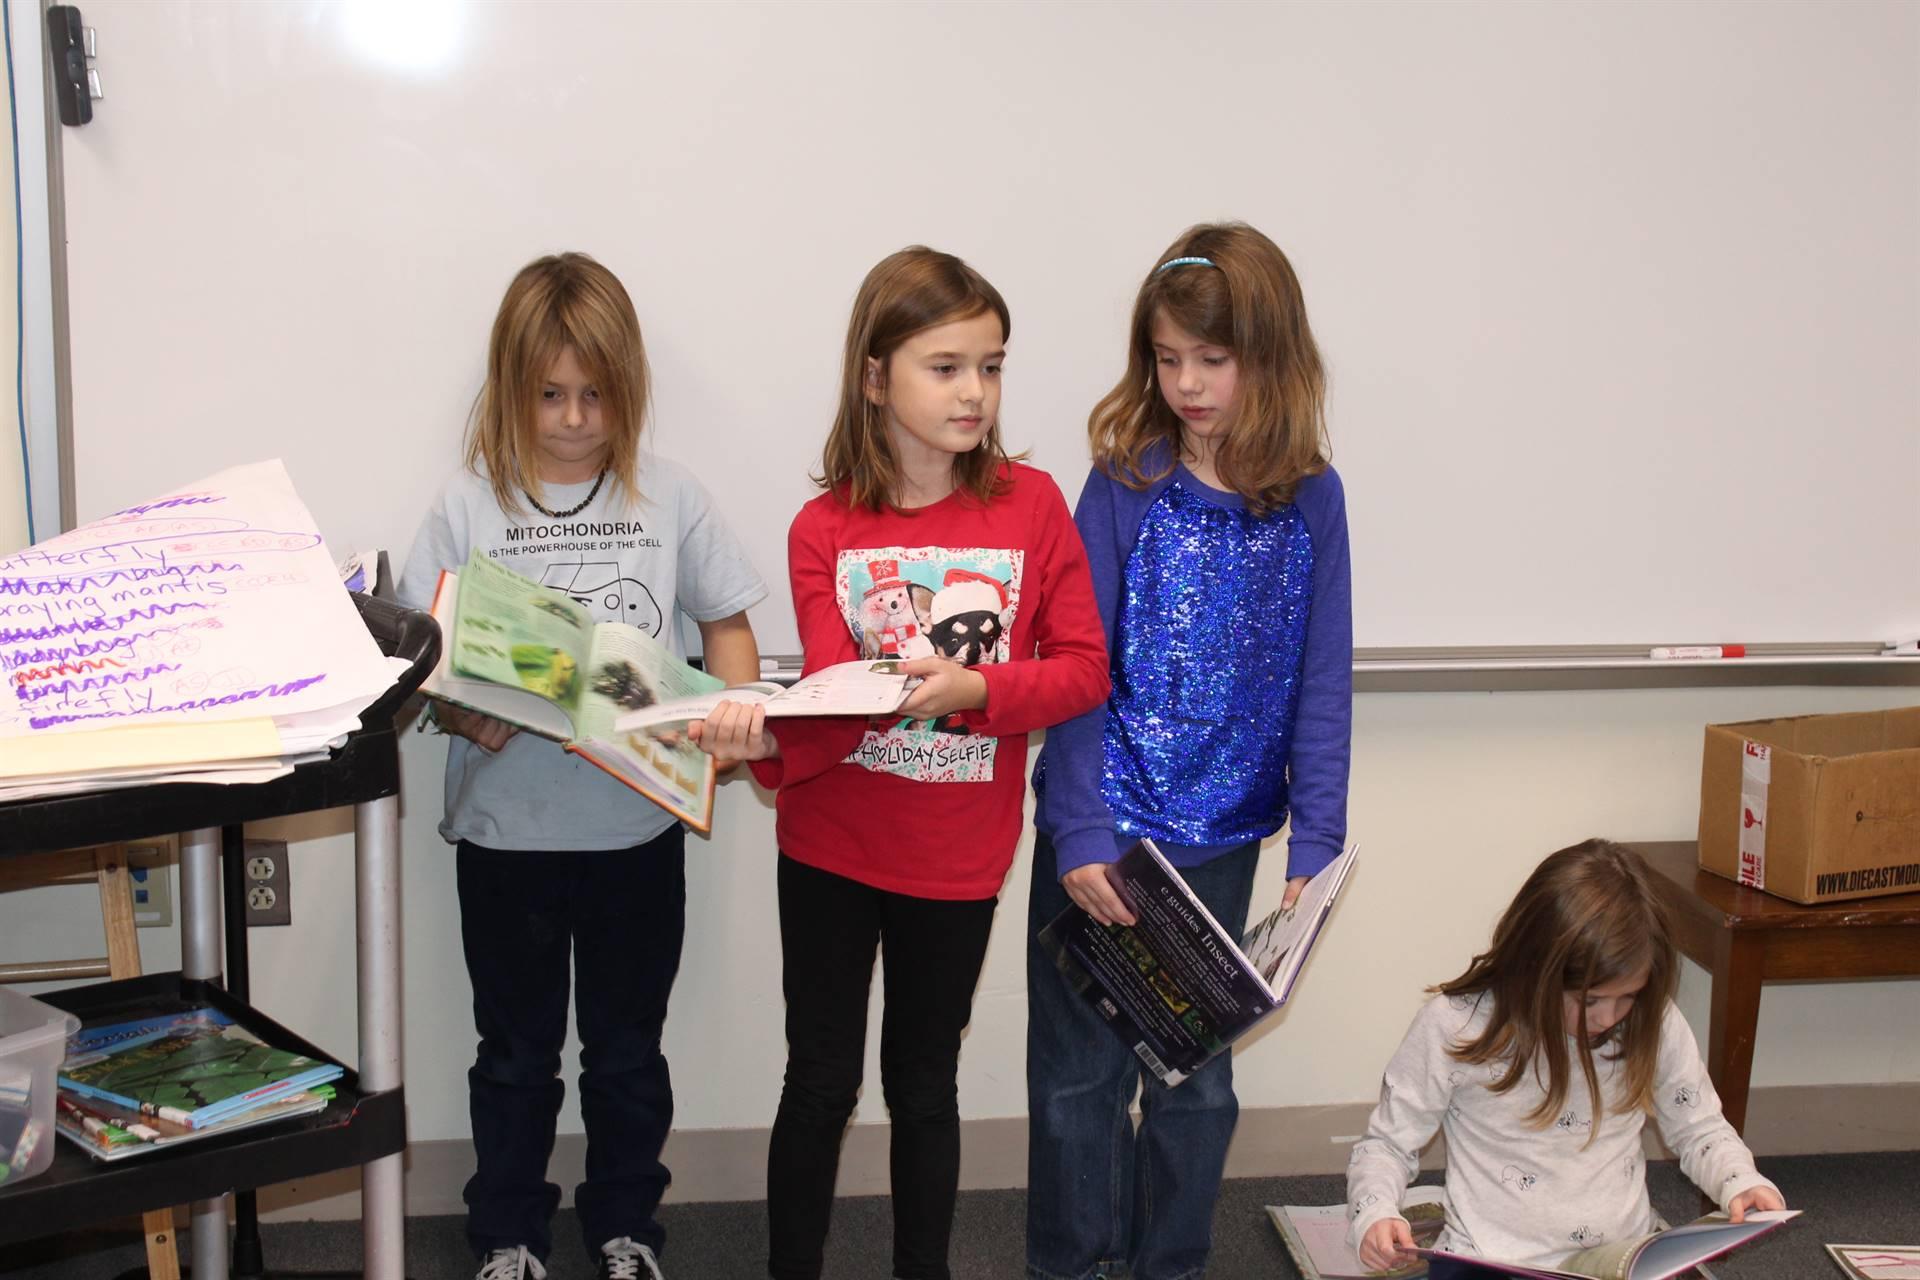 three students holding books